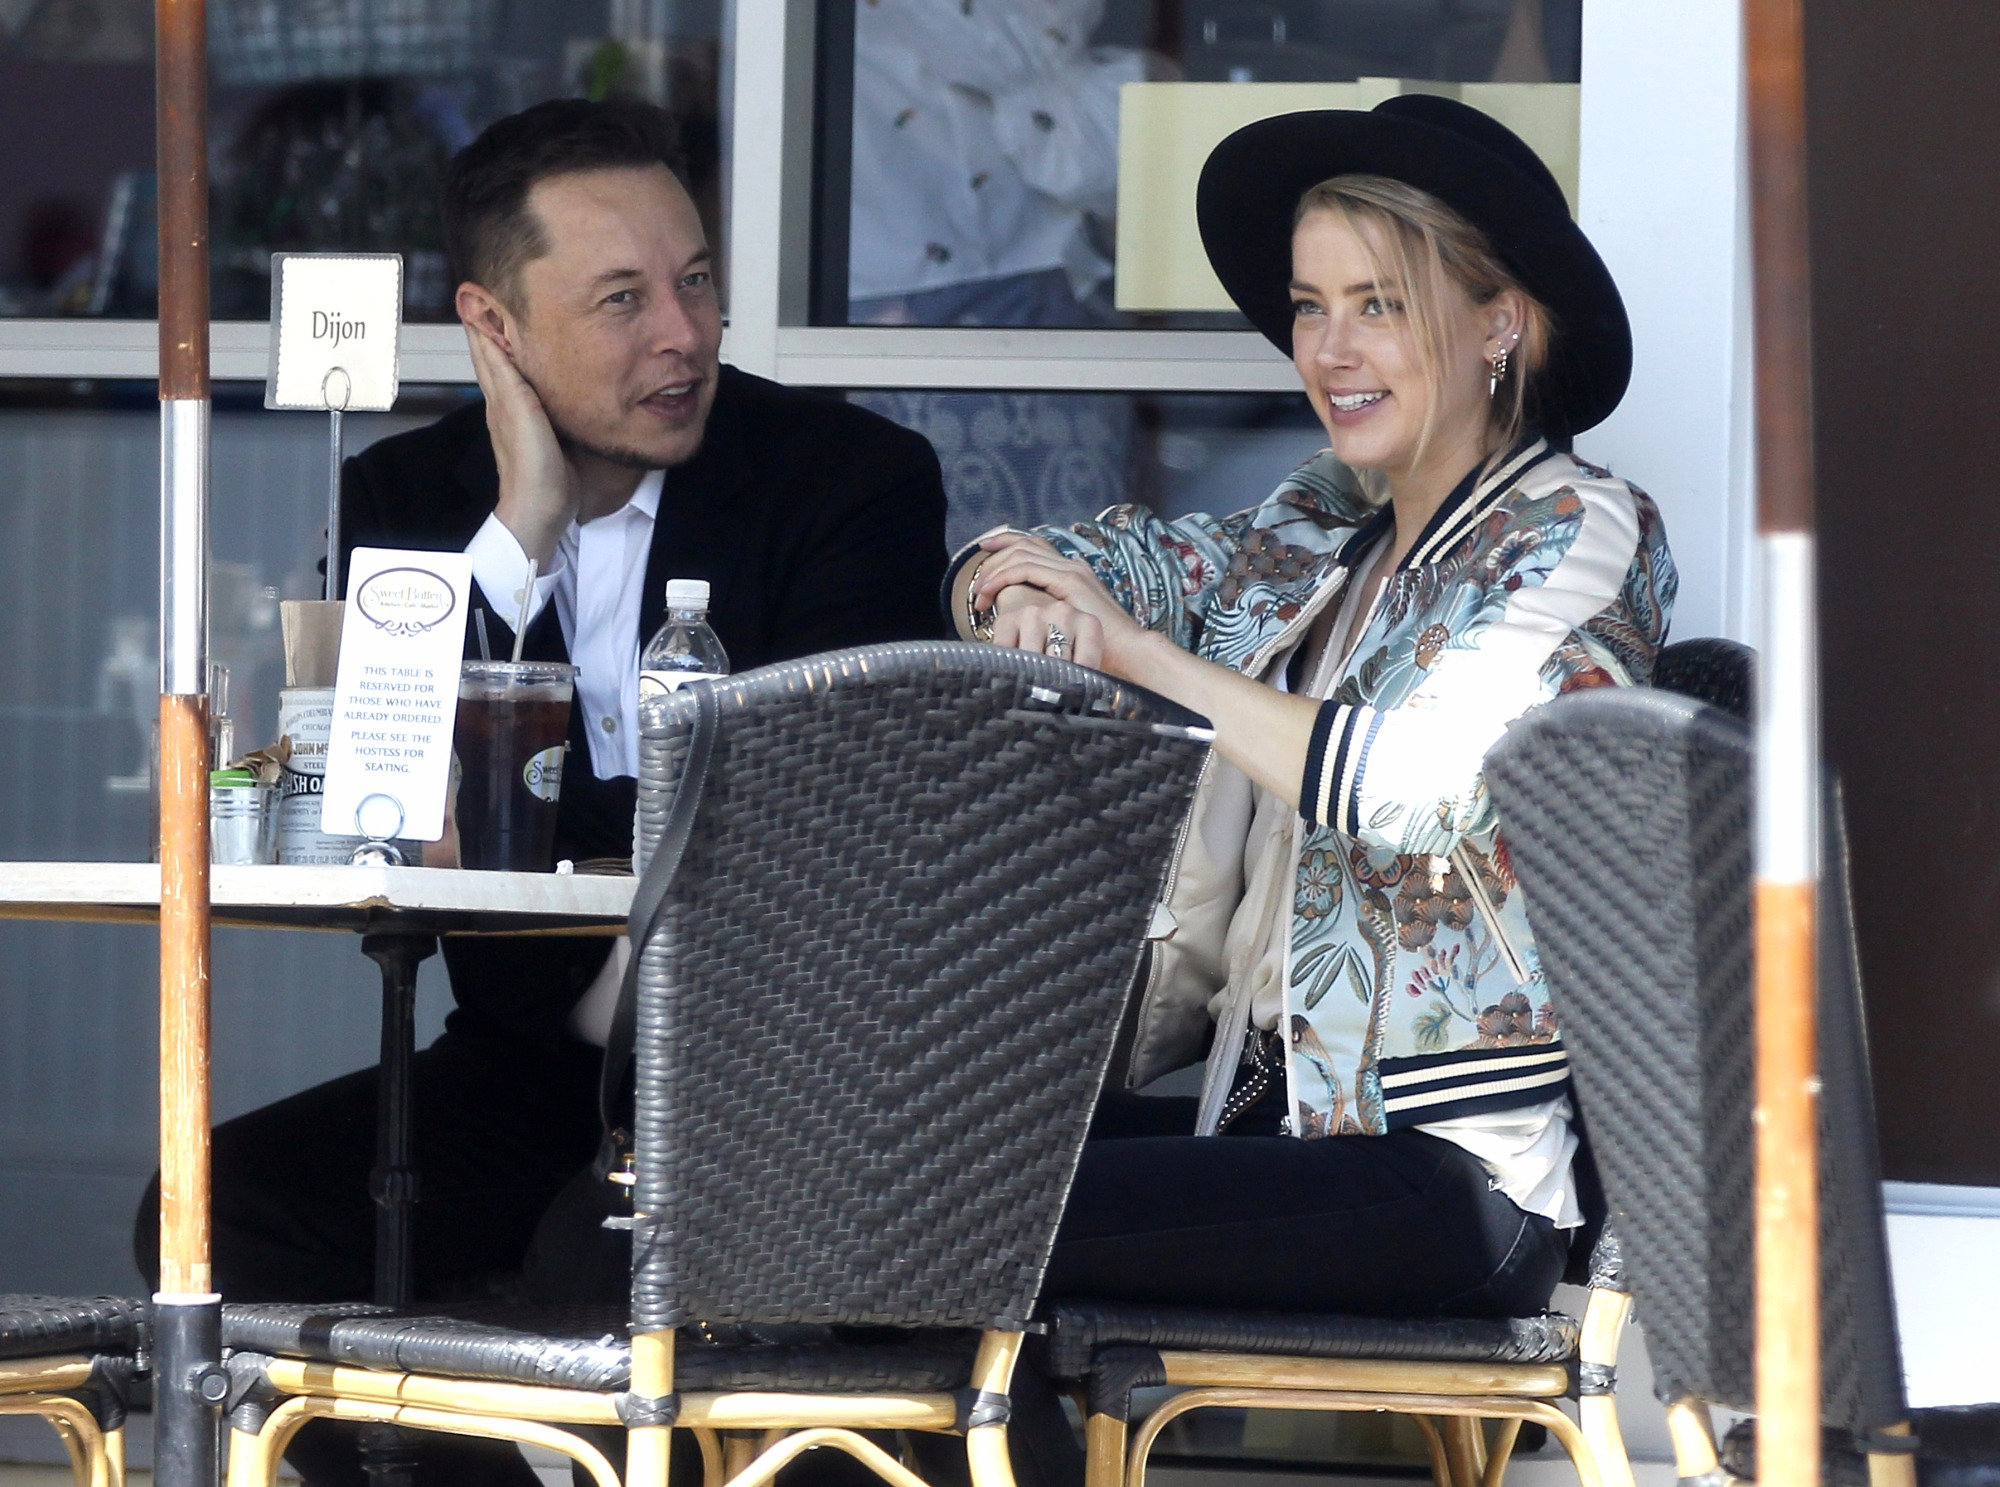 Elon Musk sitting next to Amber Heard